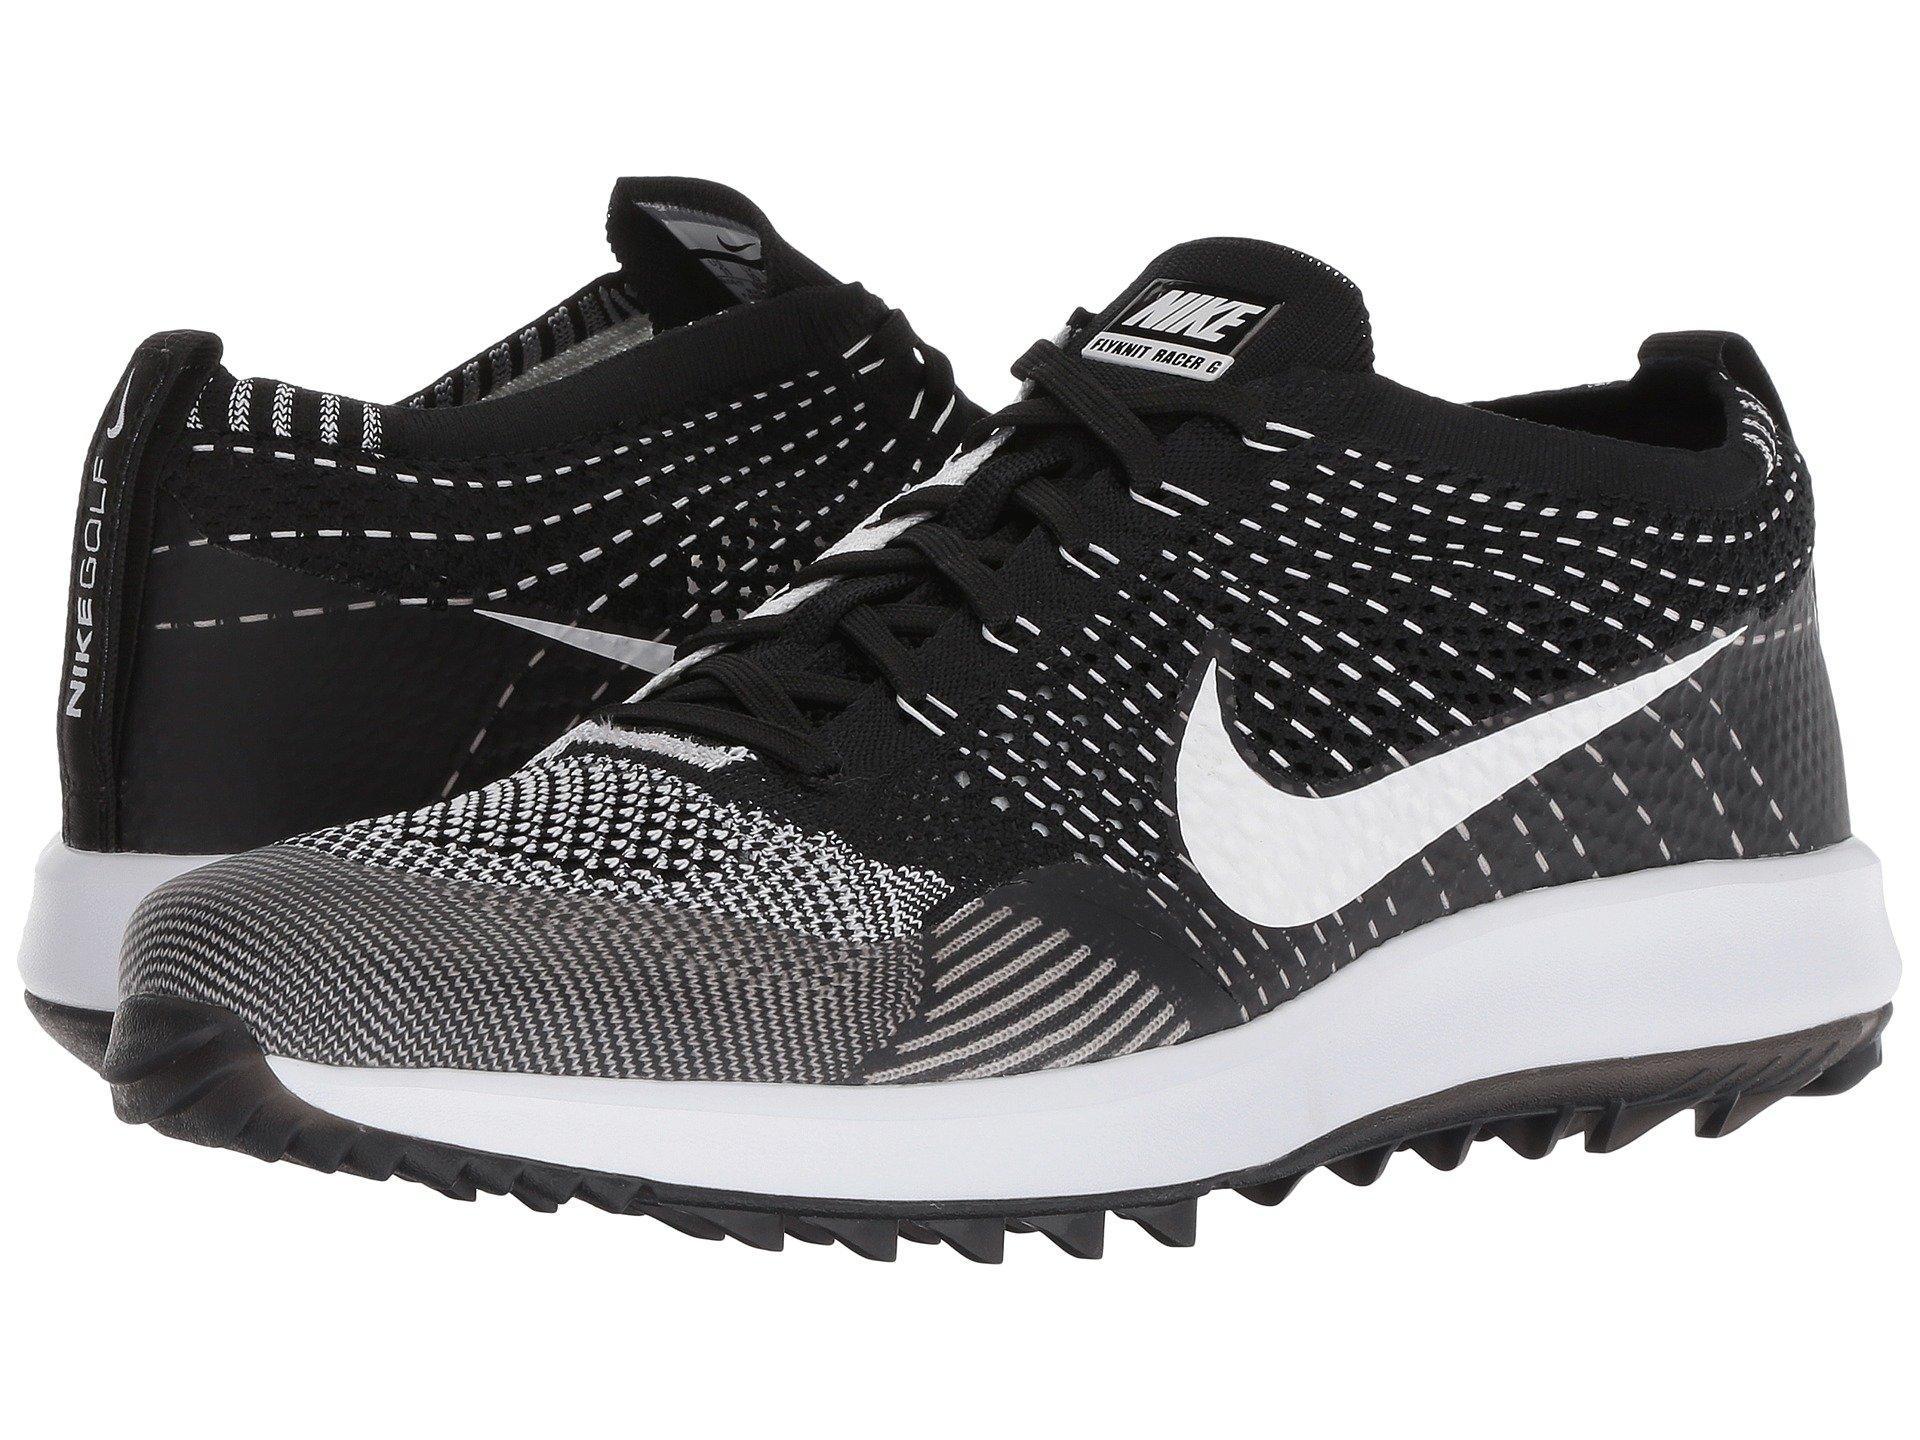 24335a6996ef8 Lyst - Nike Flyknit Racer G in Black for Men - Save 4%